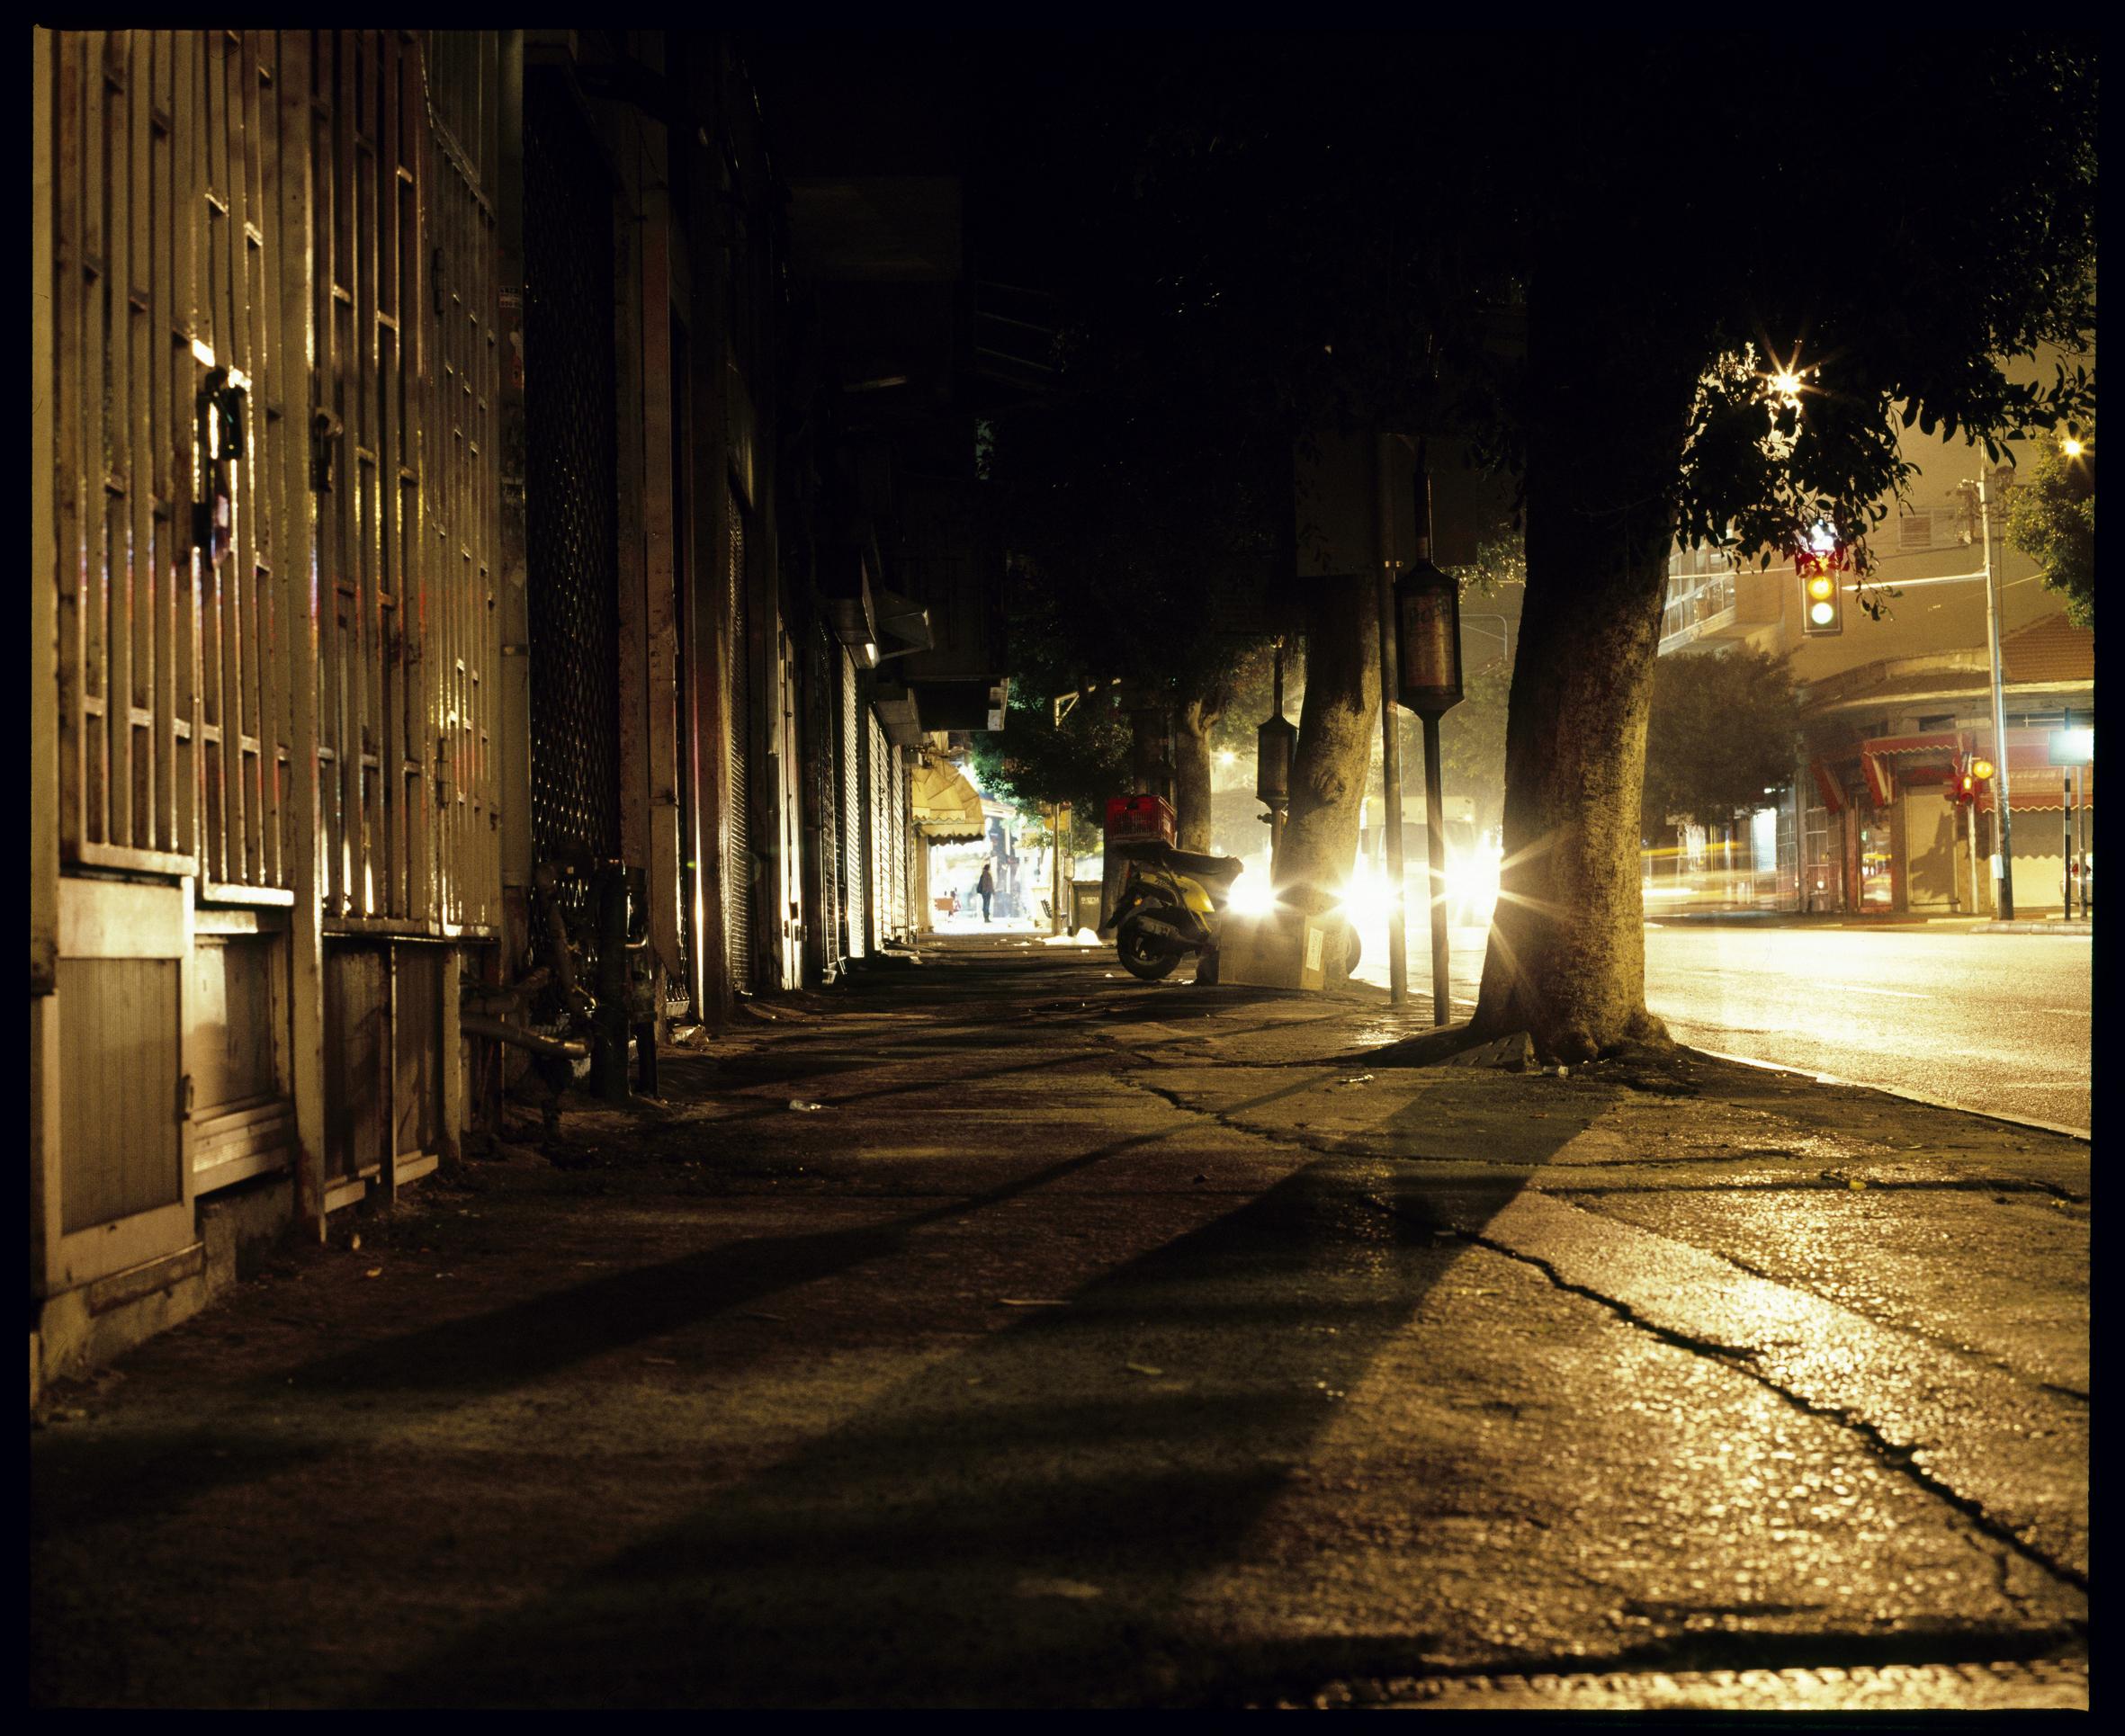 The_Ficus_Boulevard,_inkjet_print_(Analogue_photography),_90x110cm,_2009.jpg